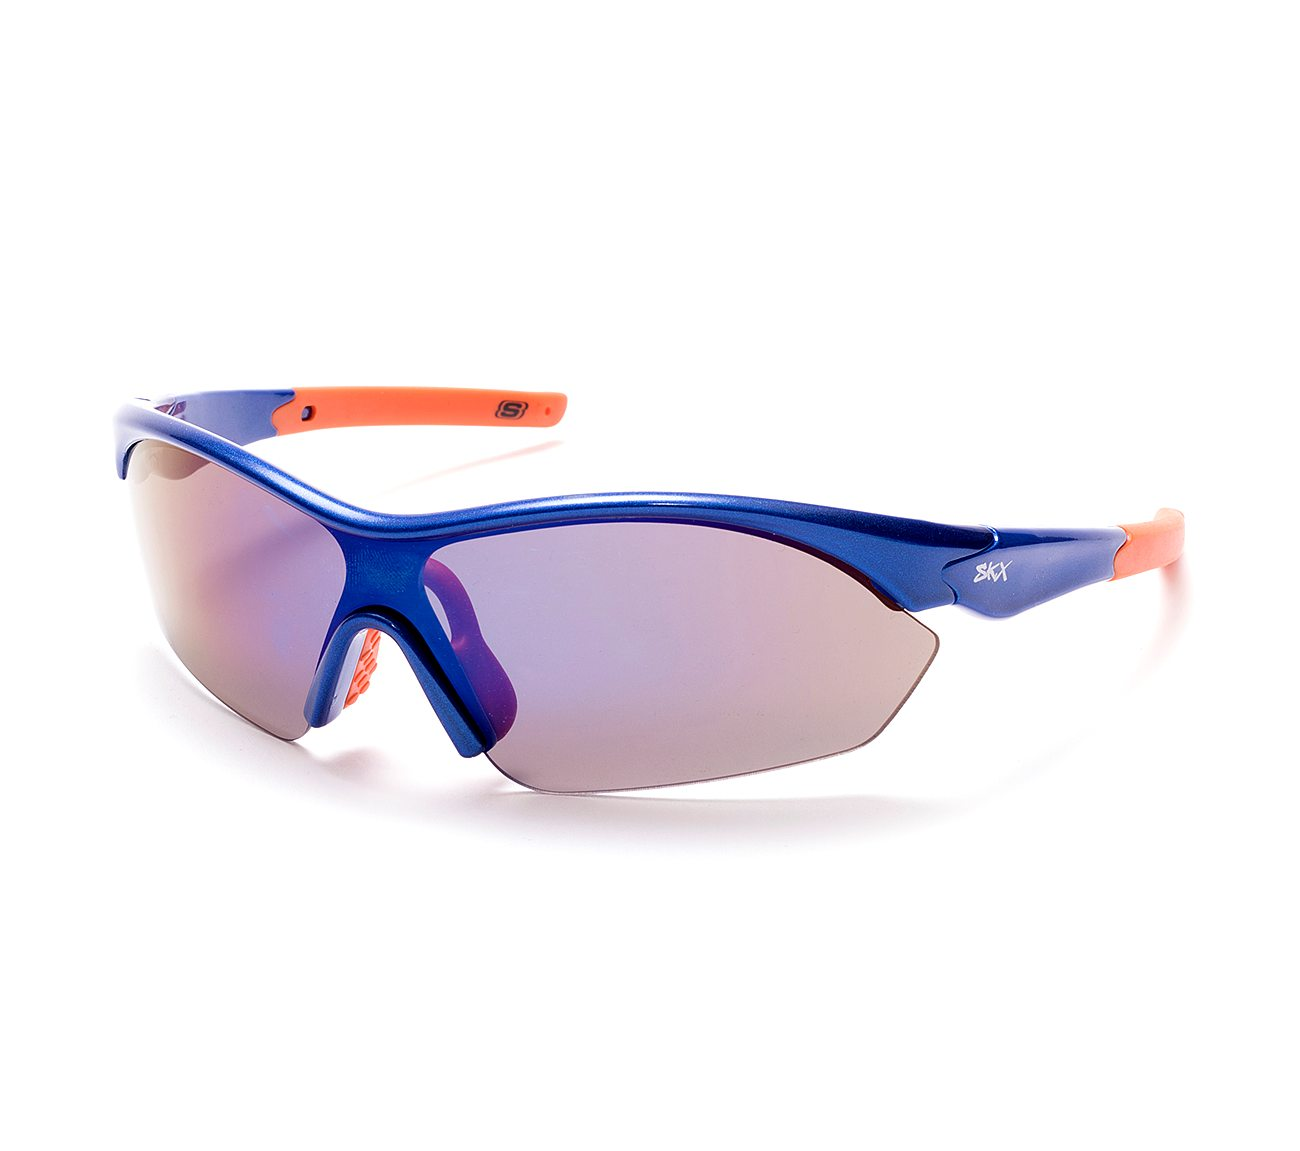 4a1efa59ad8a Buy SKECHERS Kids' Sport Wrap Sunglasses Sunglasses Shoes only $13.00